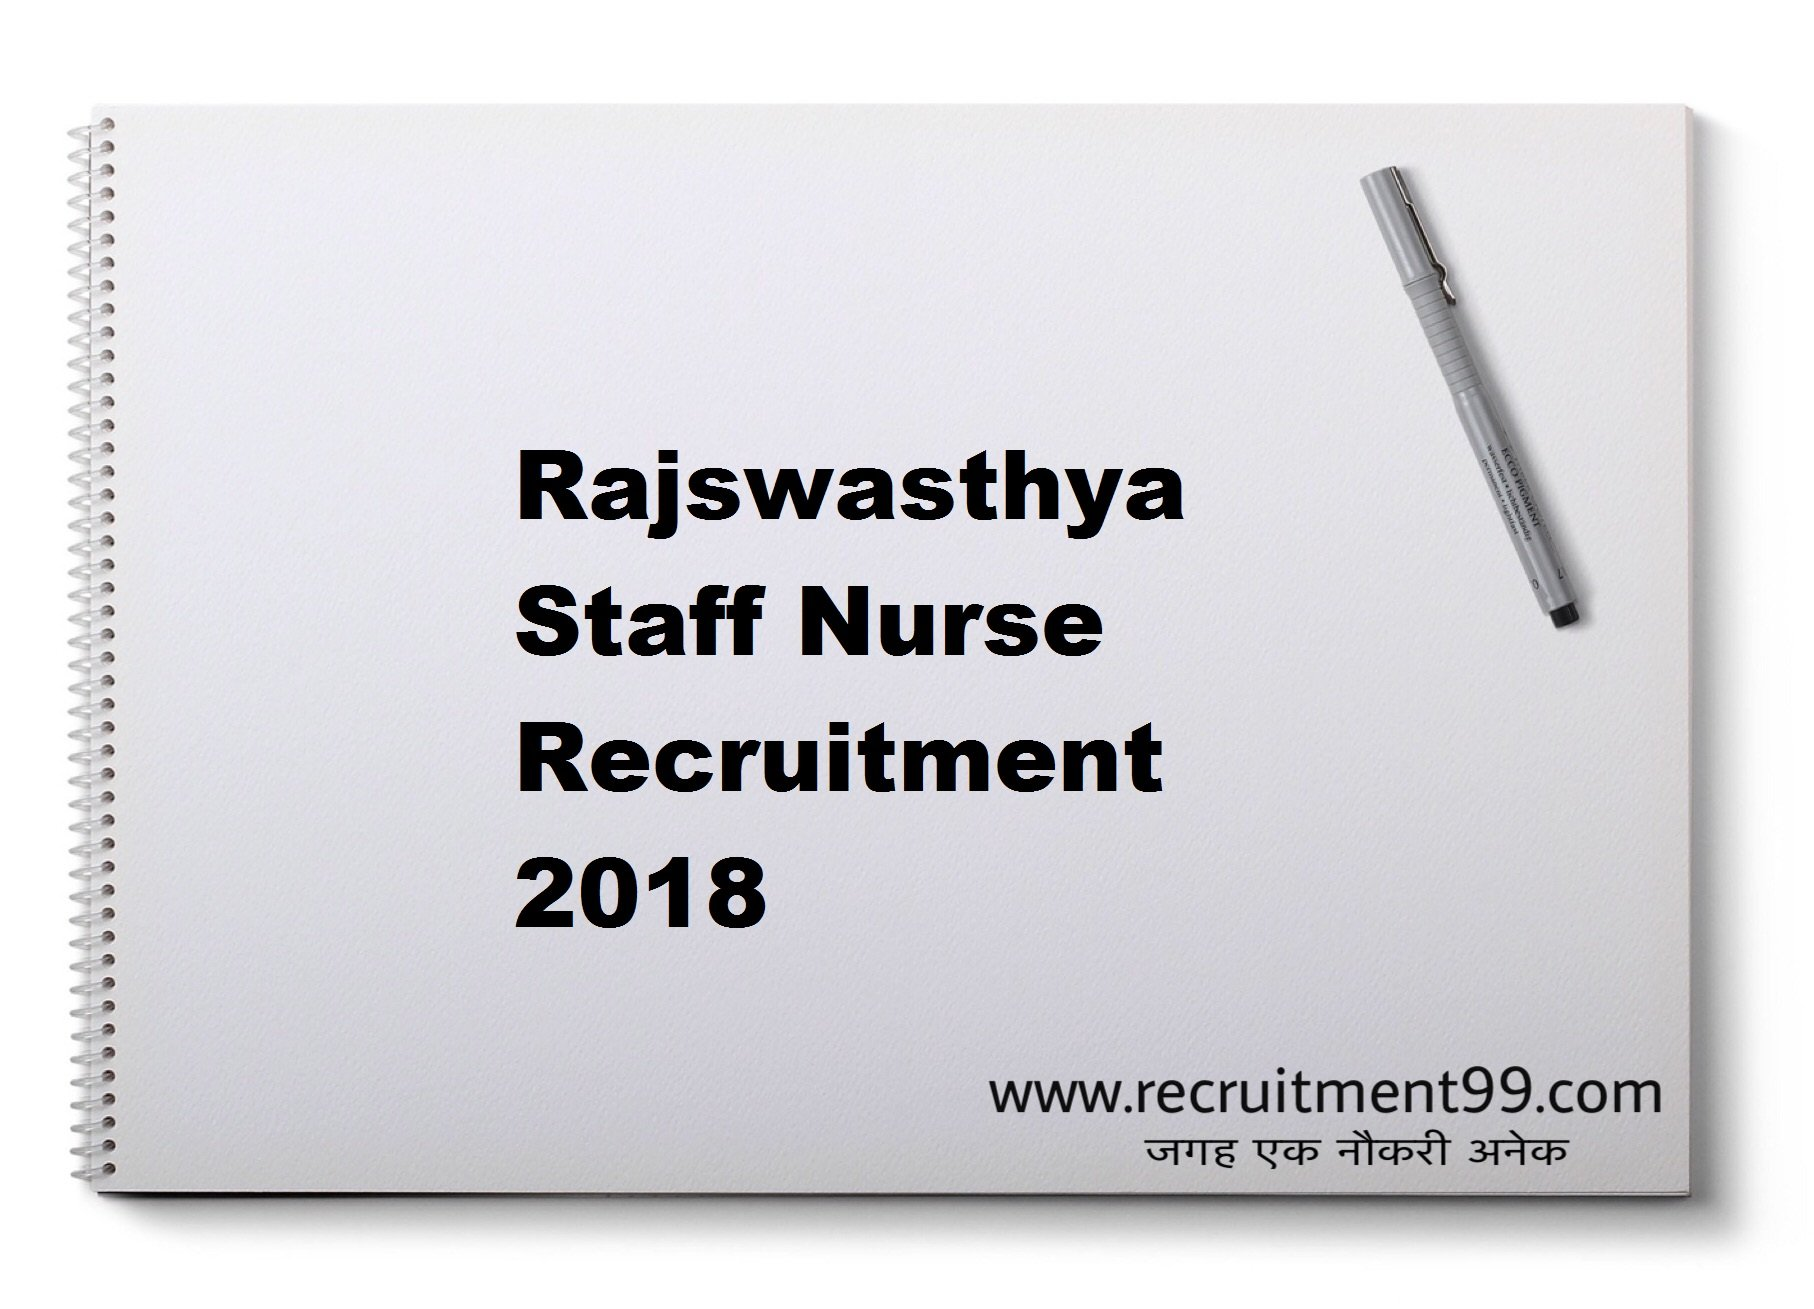 Rajswasthya Staff Nurse Recruitment Admit Card Result 2018